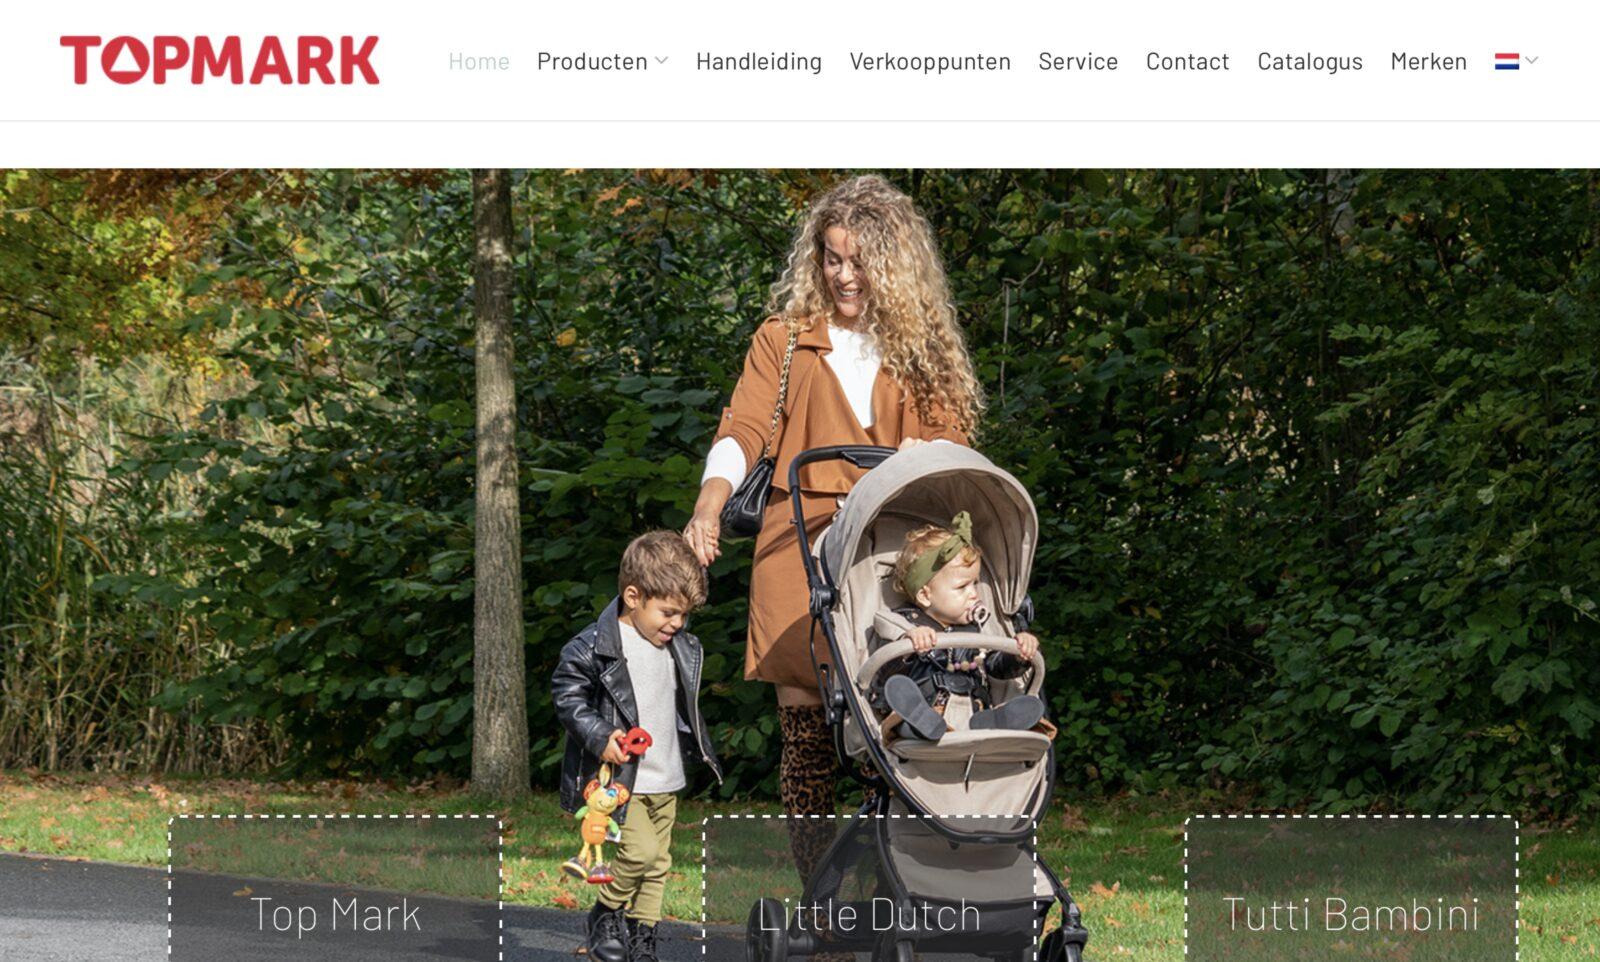 Screenshot der Marke Top Mark